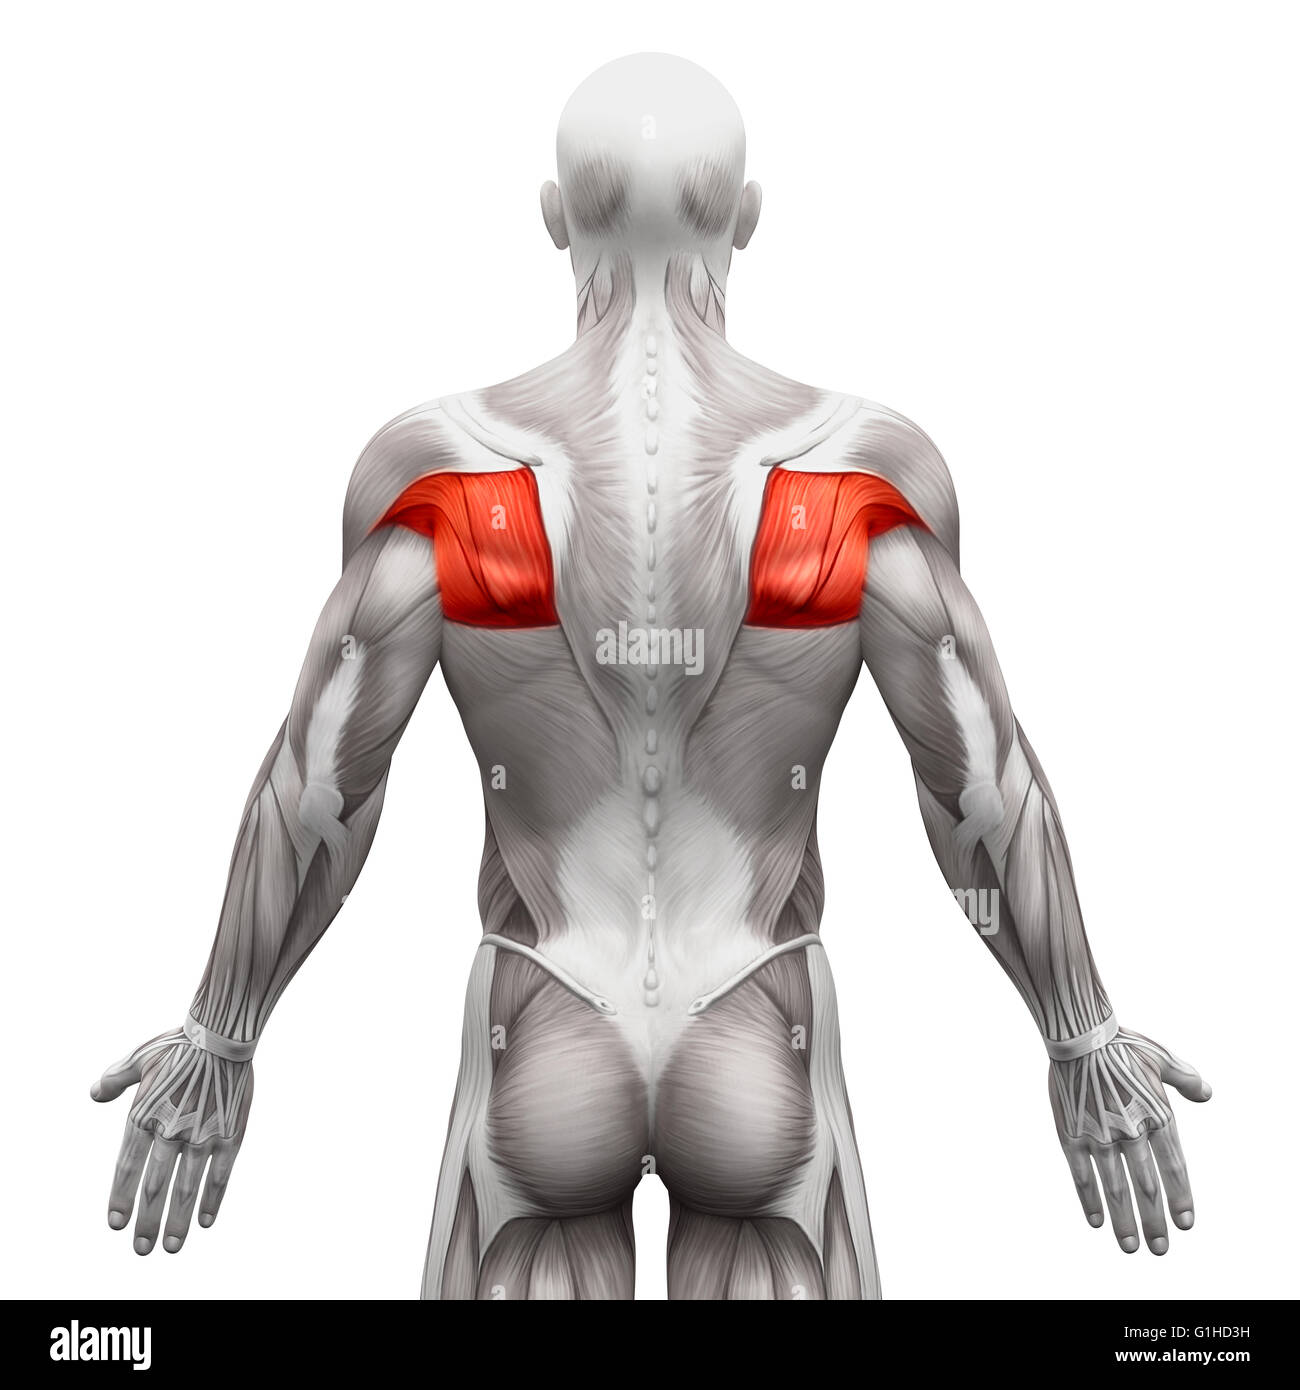 Upper Body Anatomy Stock Photos & Upper Body Anatomy Stock Images ...